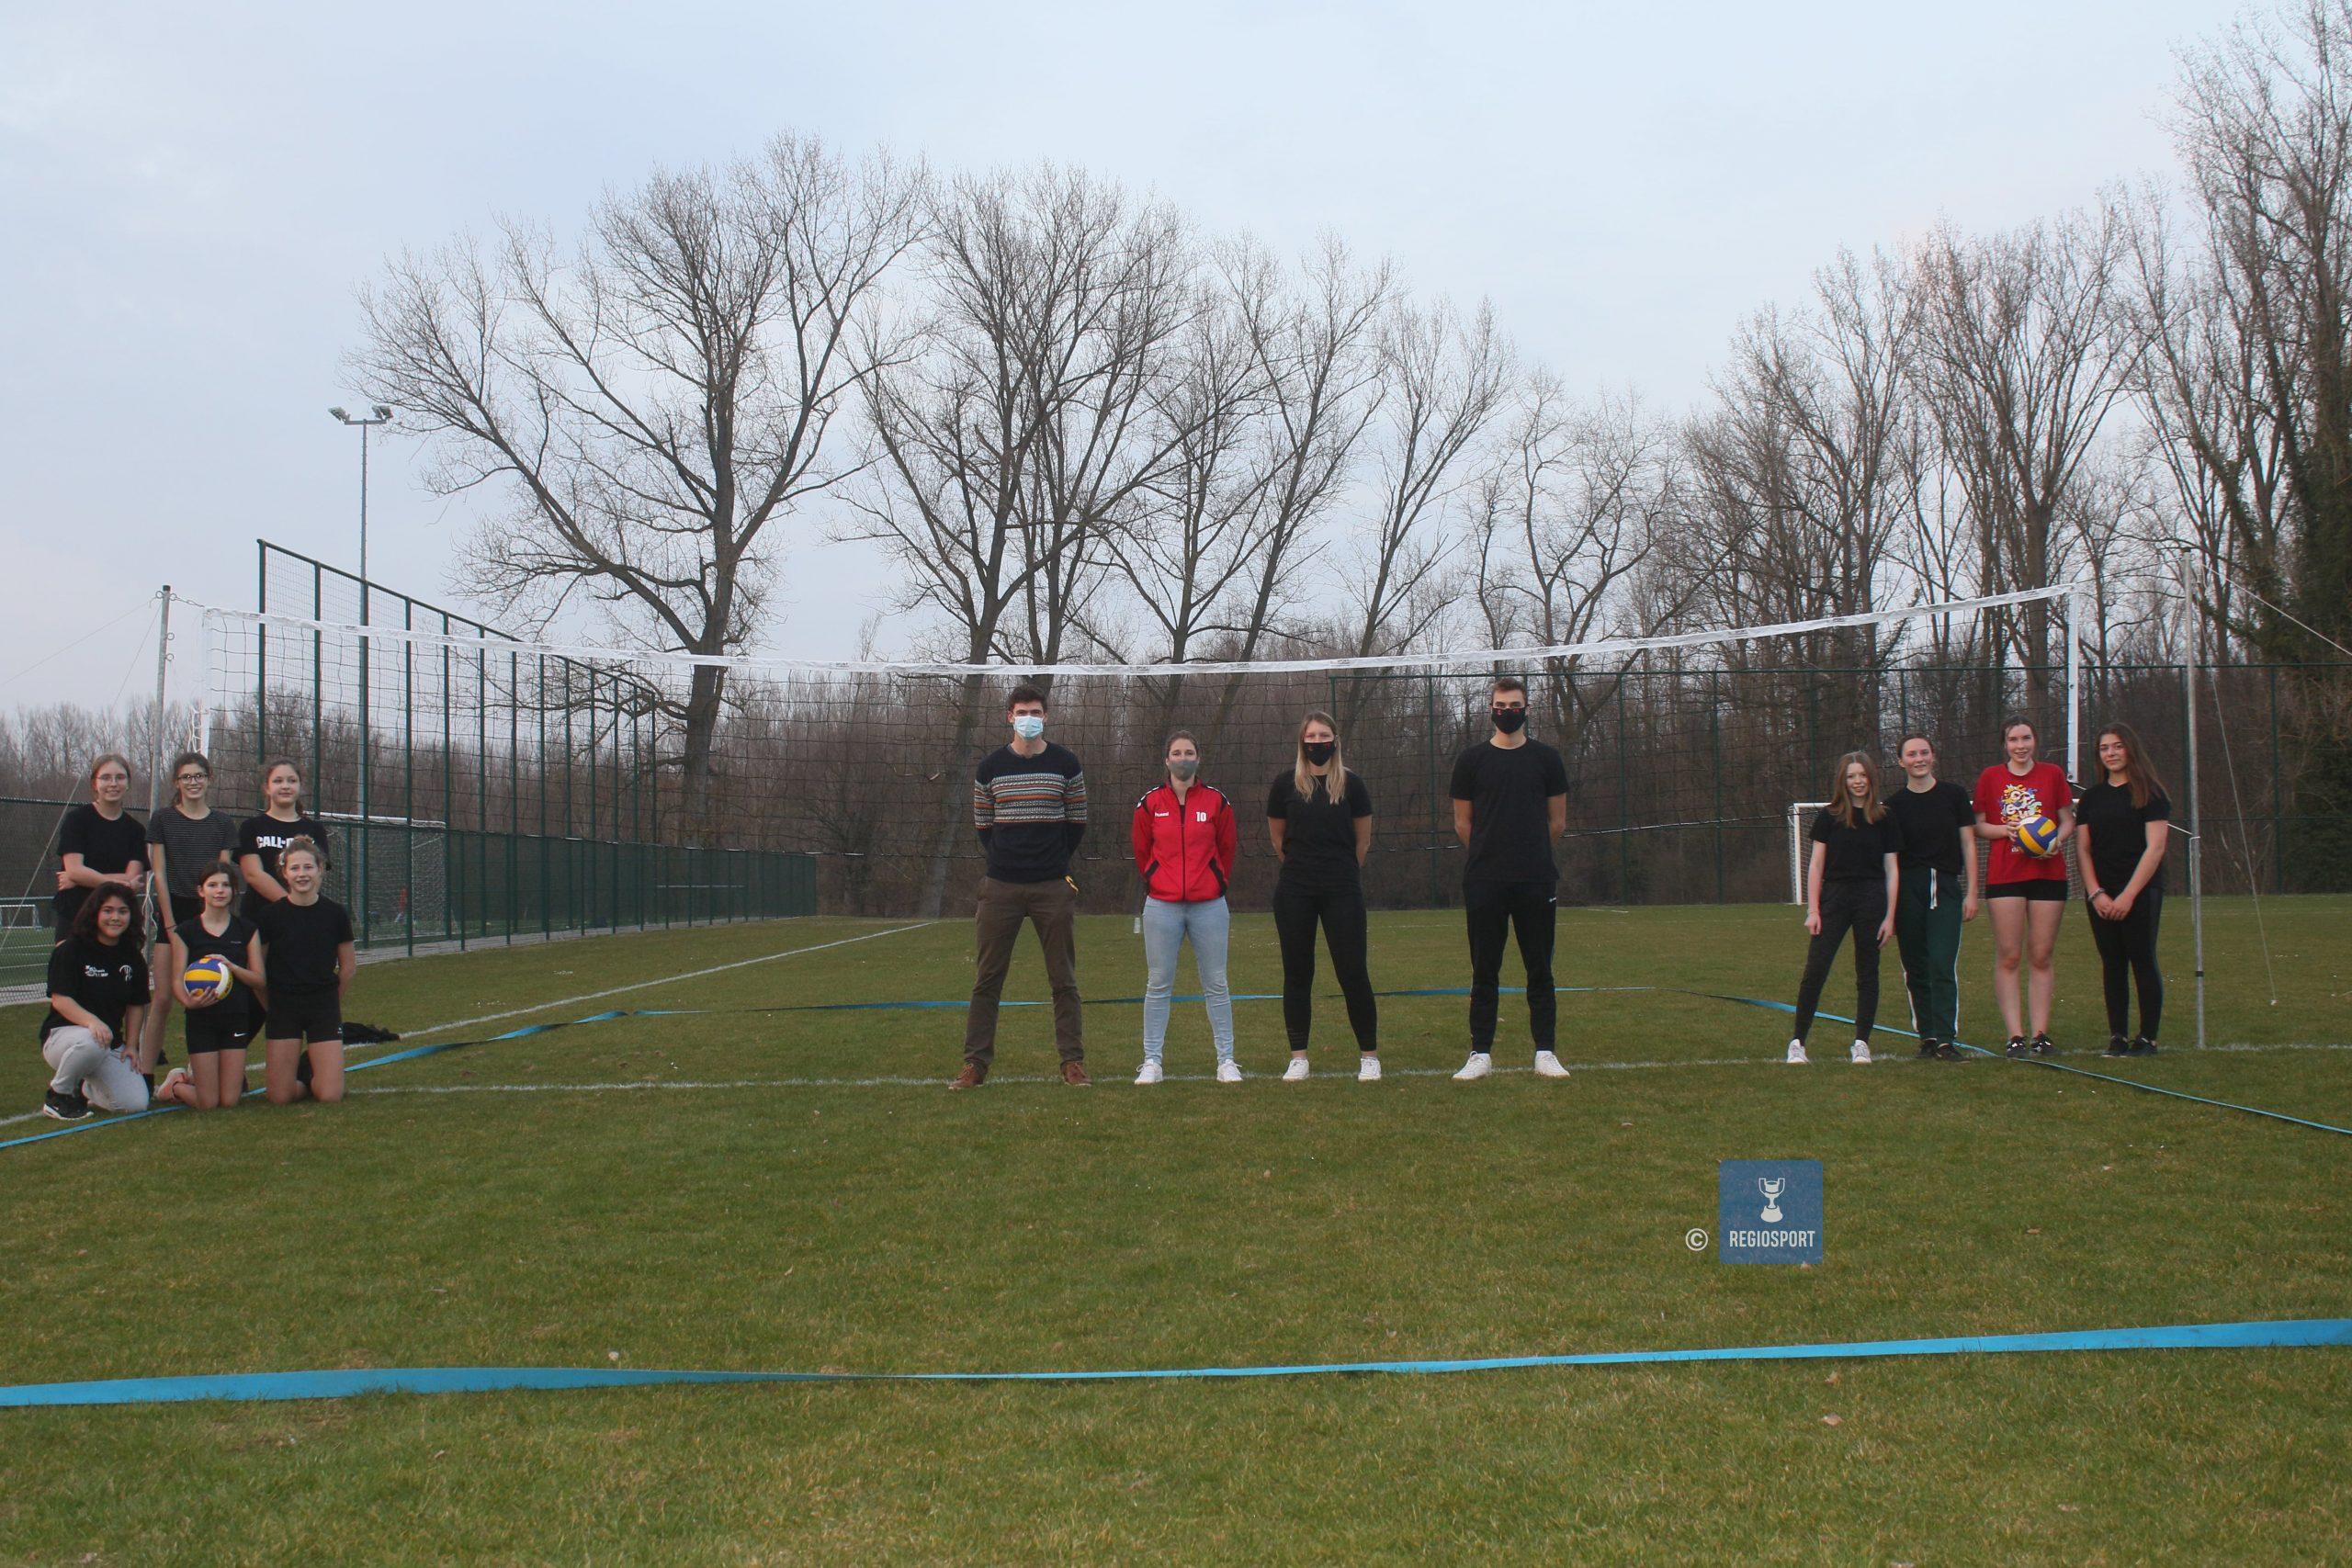 Feniks Haacht scoort met grasvolleybal bij jeugd, elke dag training mogelijk!